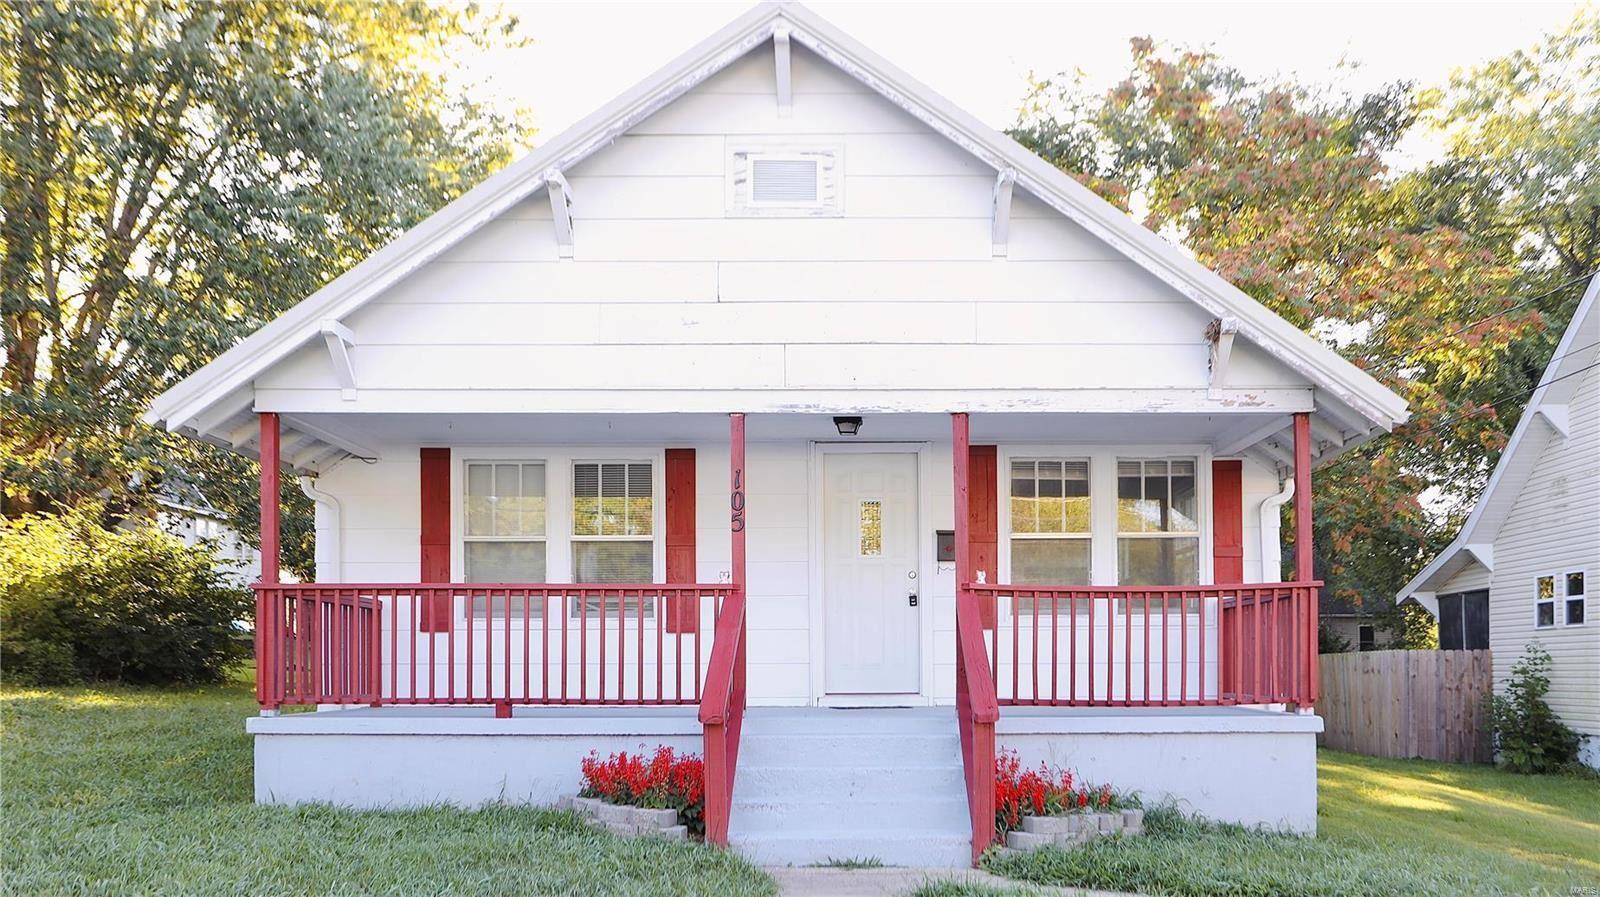 105 S Rolla Street, Rolla, MO 65401 - MLS#: 21040544